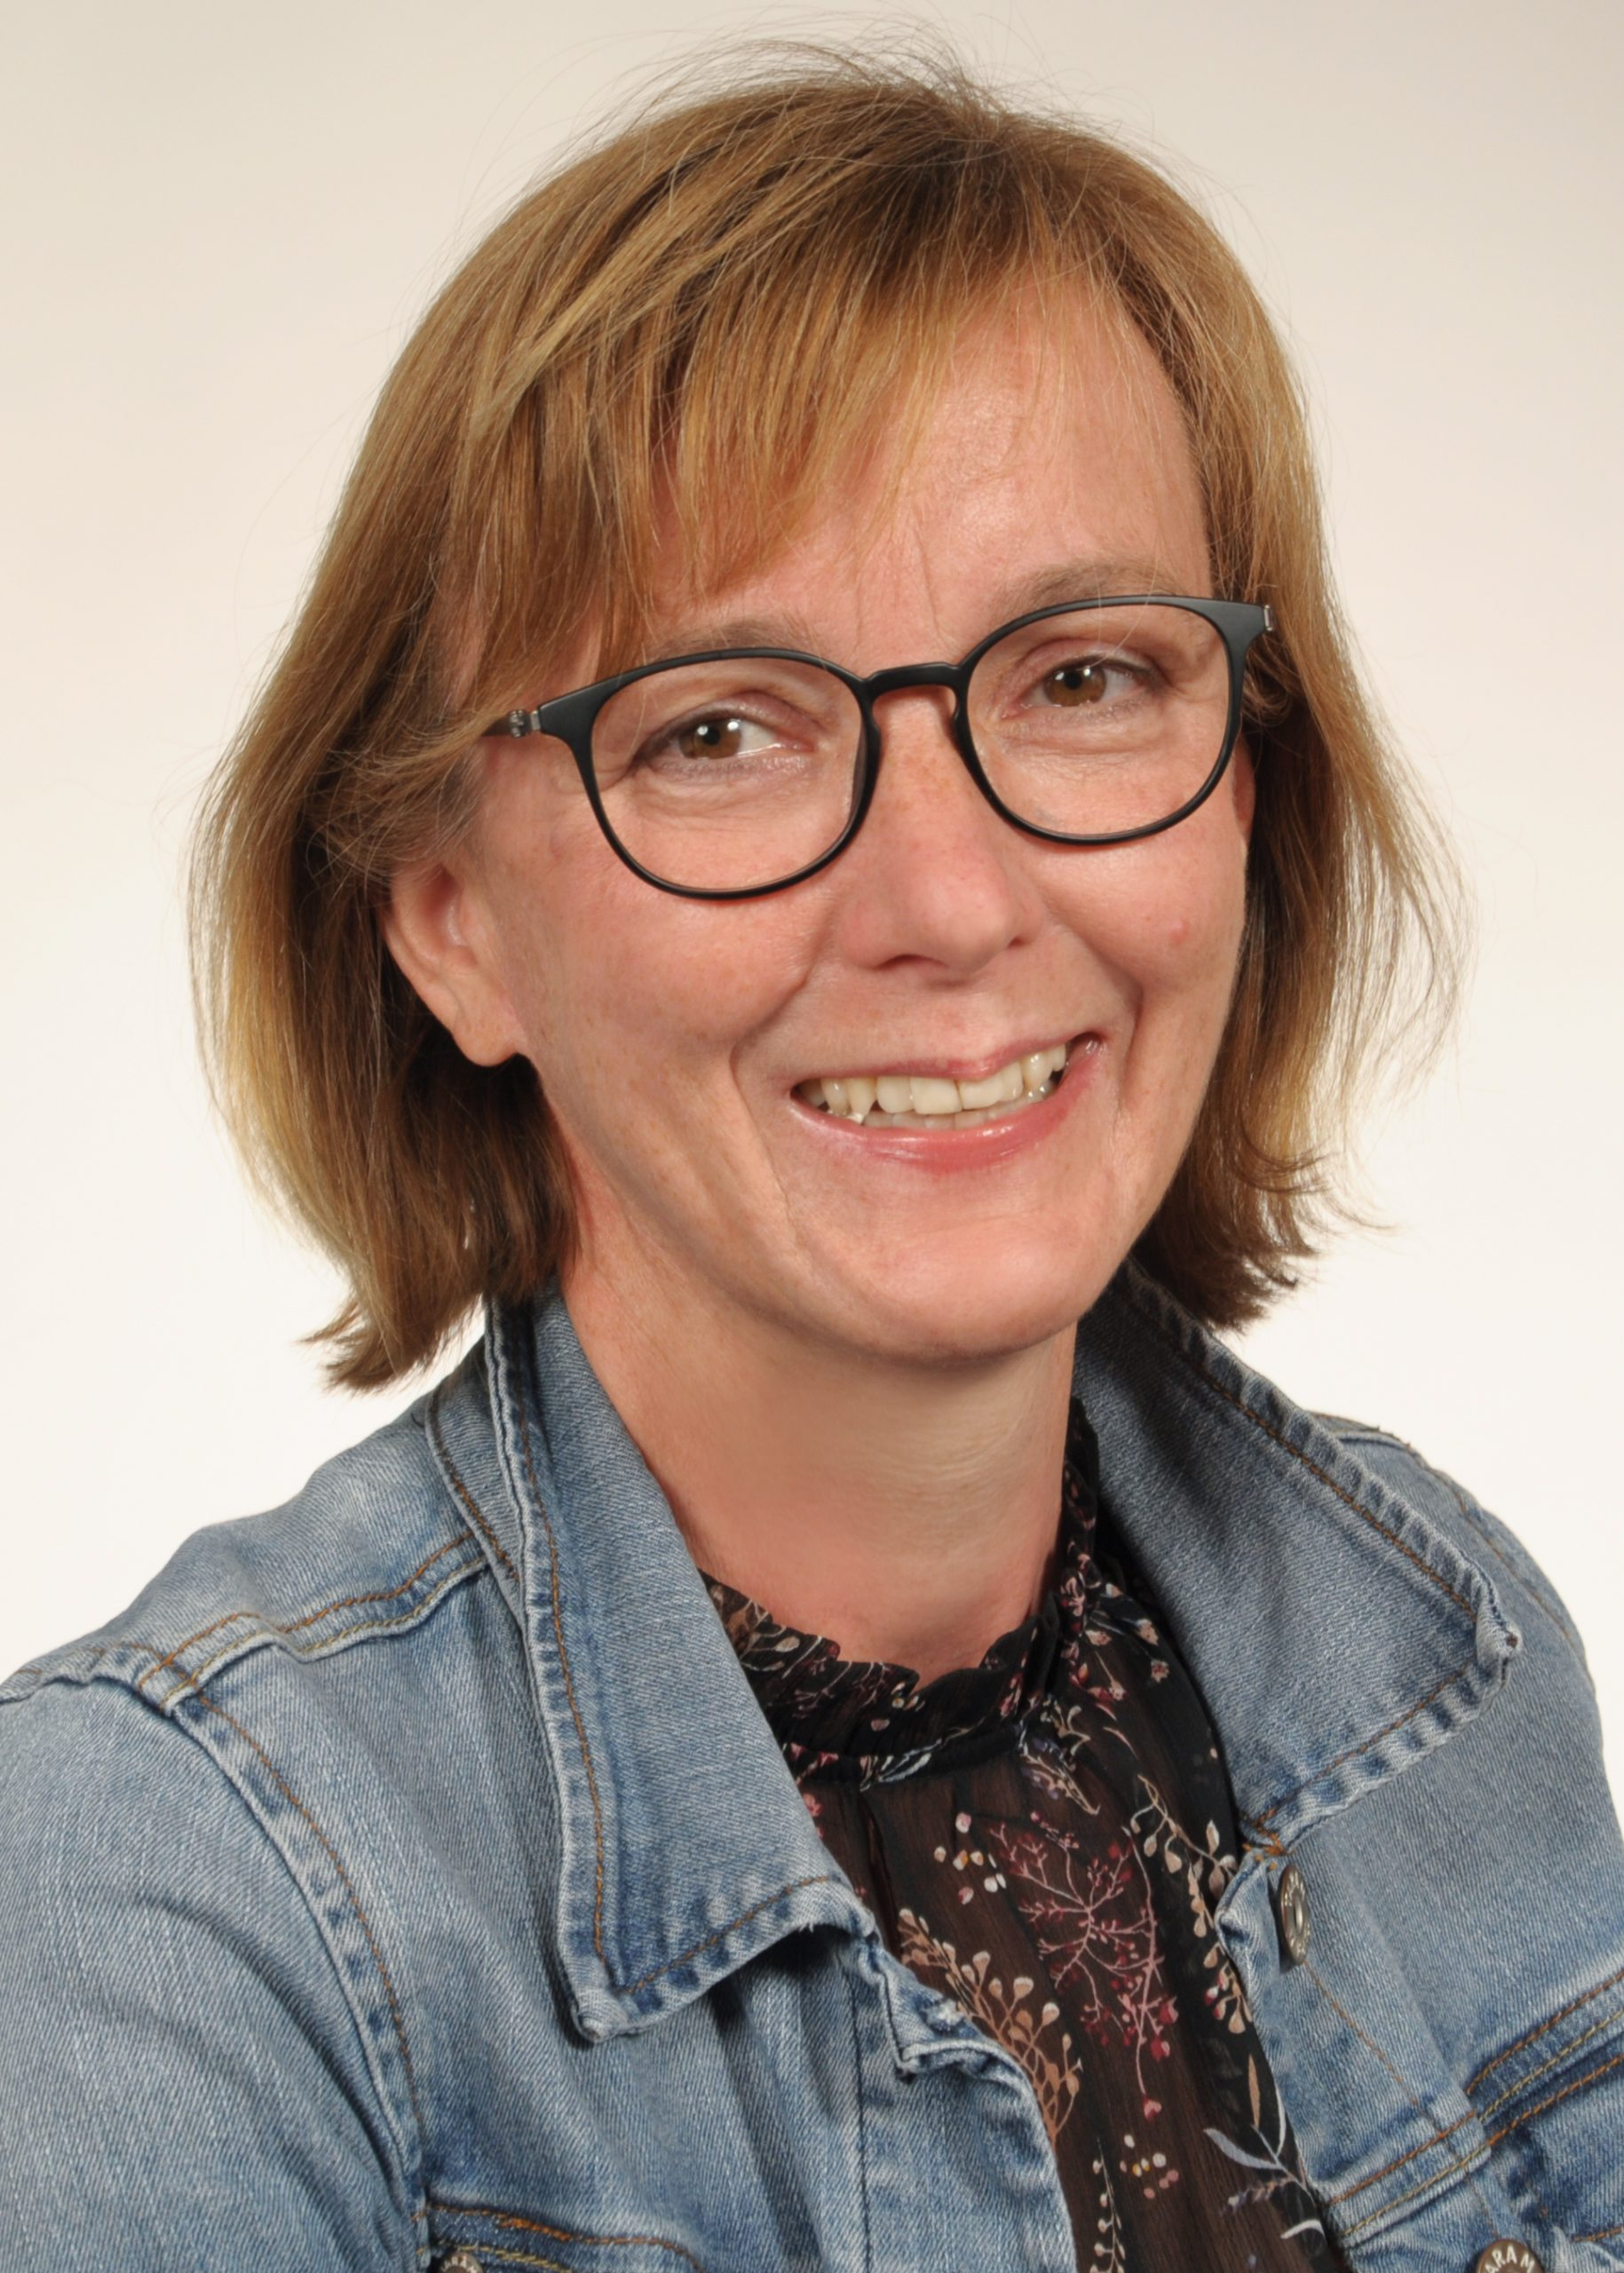 Heidi Stelljes